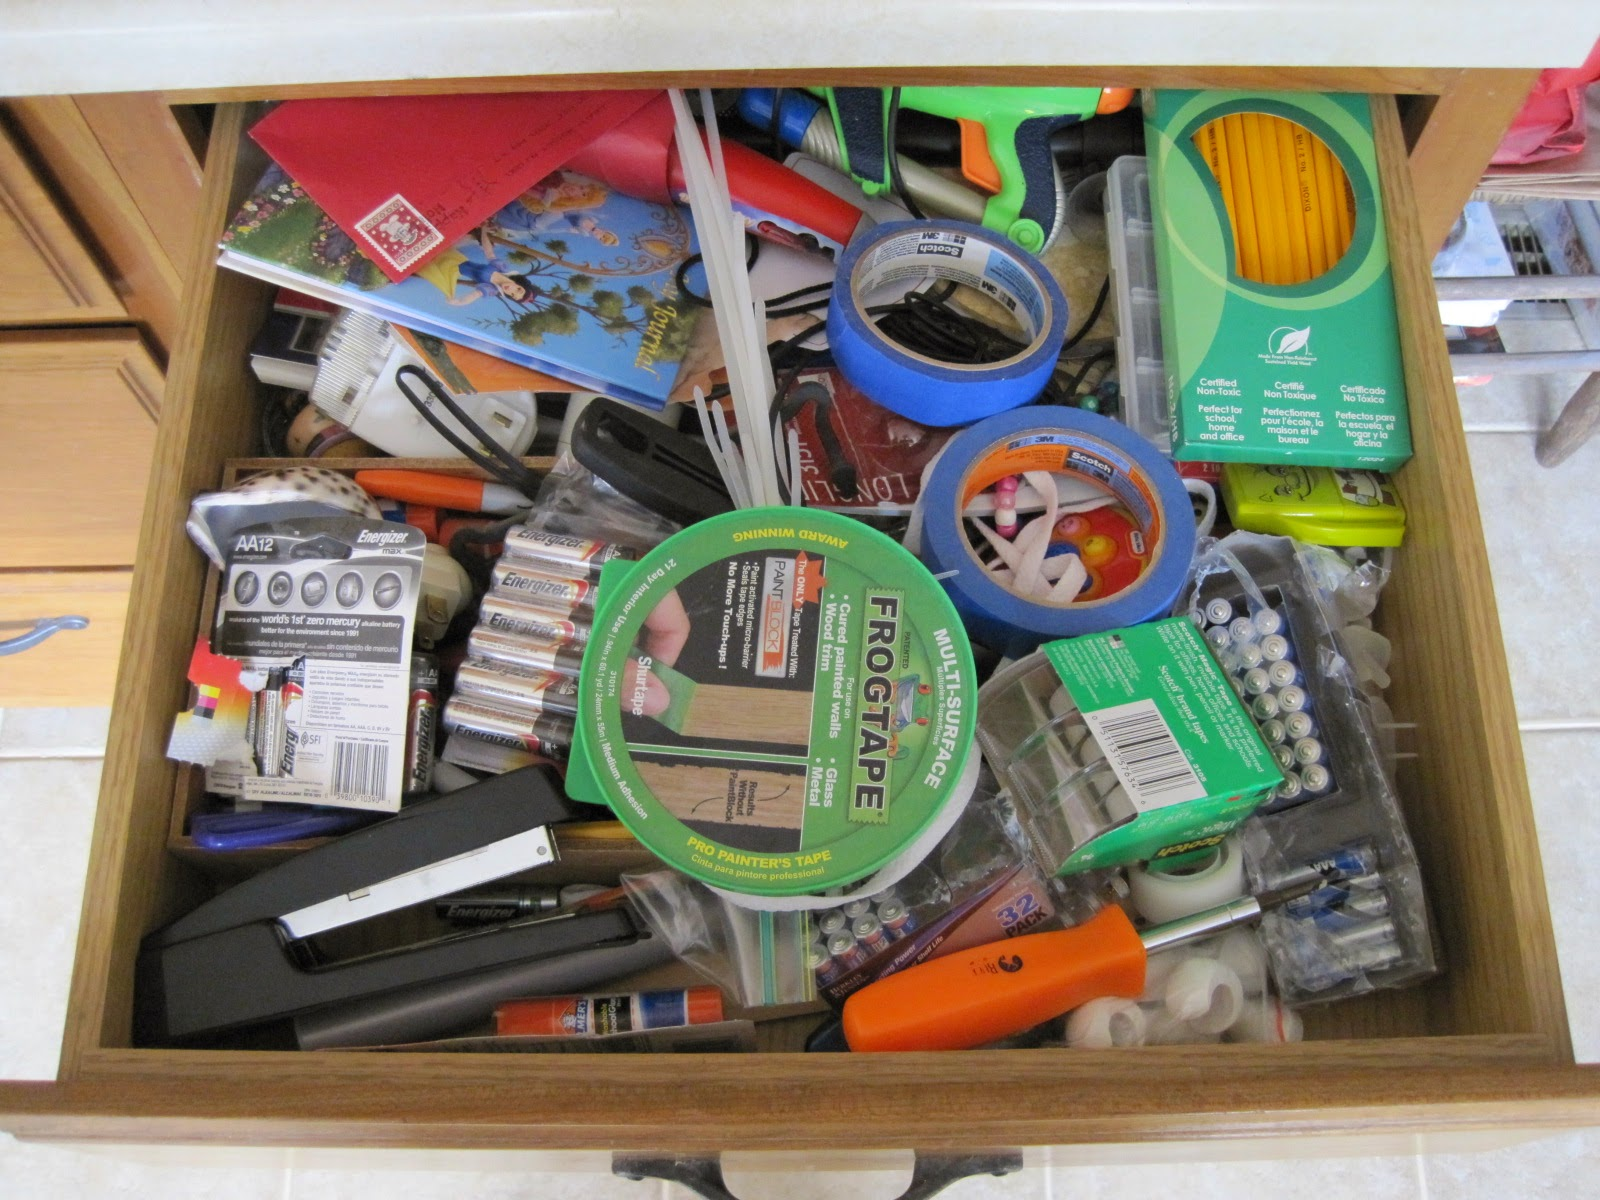 Clever crafty cookin 39 mama junk drawer organization for Kitchen junk drawer